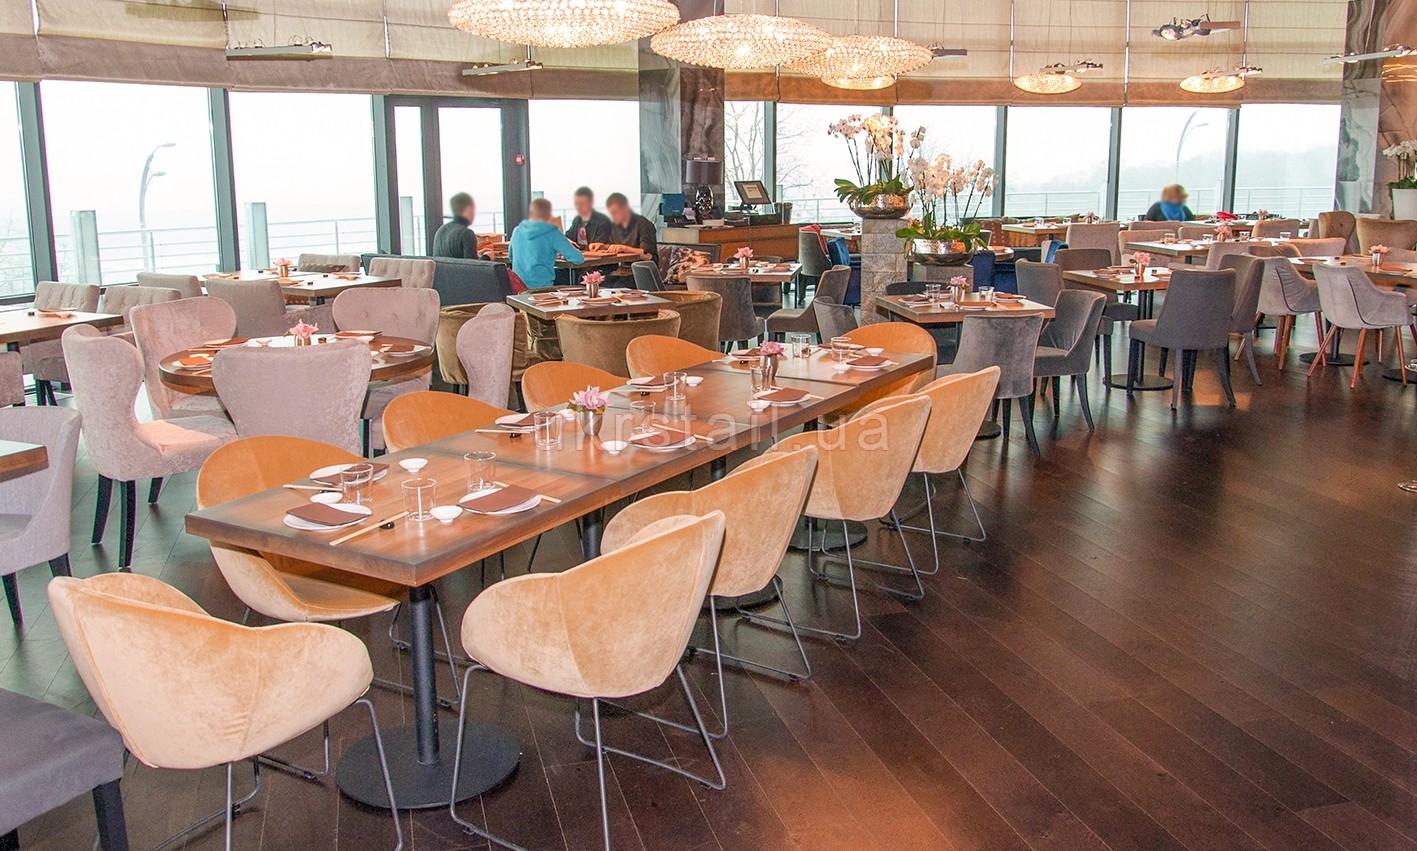 Интерьер ресторана Guramma на Днепровском спуске 11